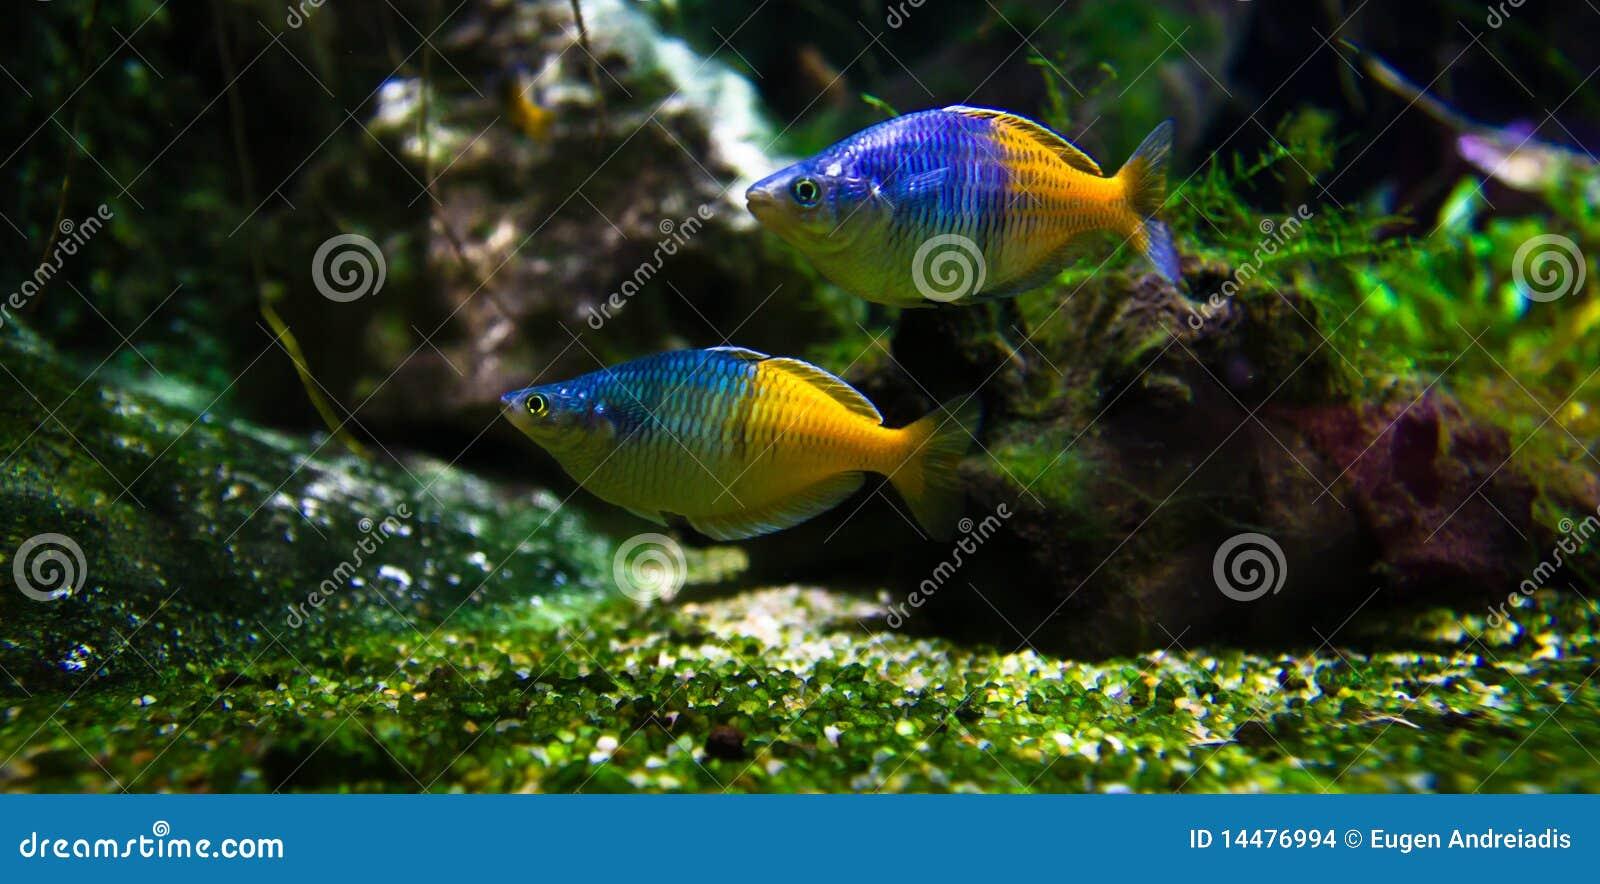 Exotische fische im aquarium stockbilder bild 14476994 for Fische aquarium